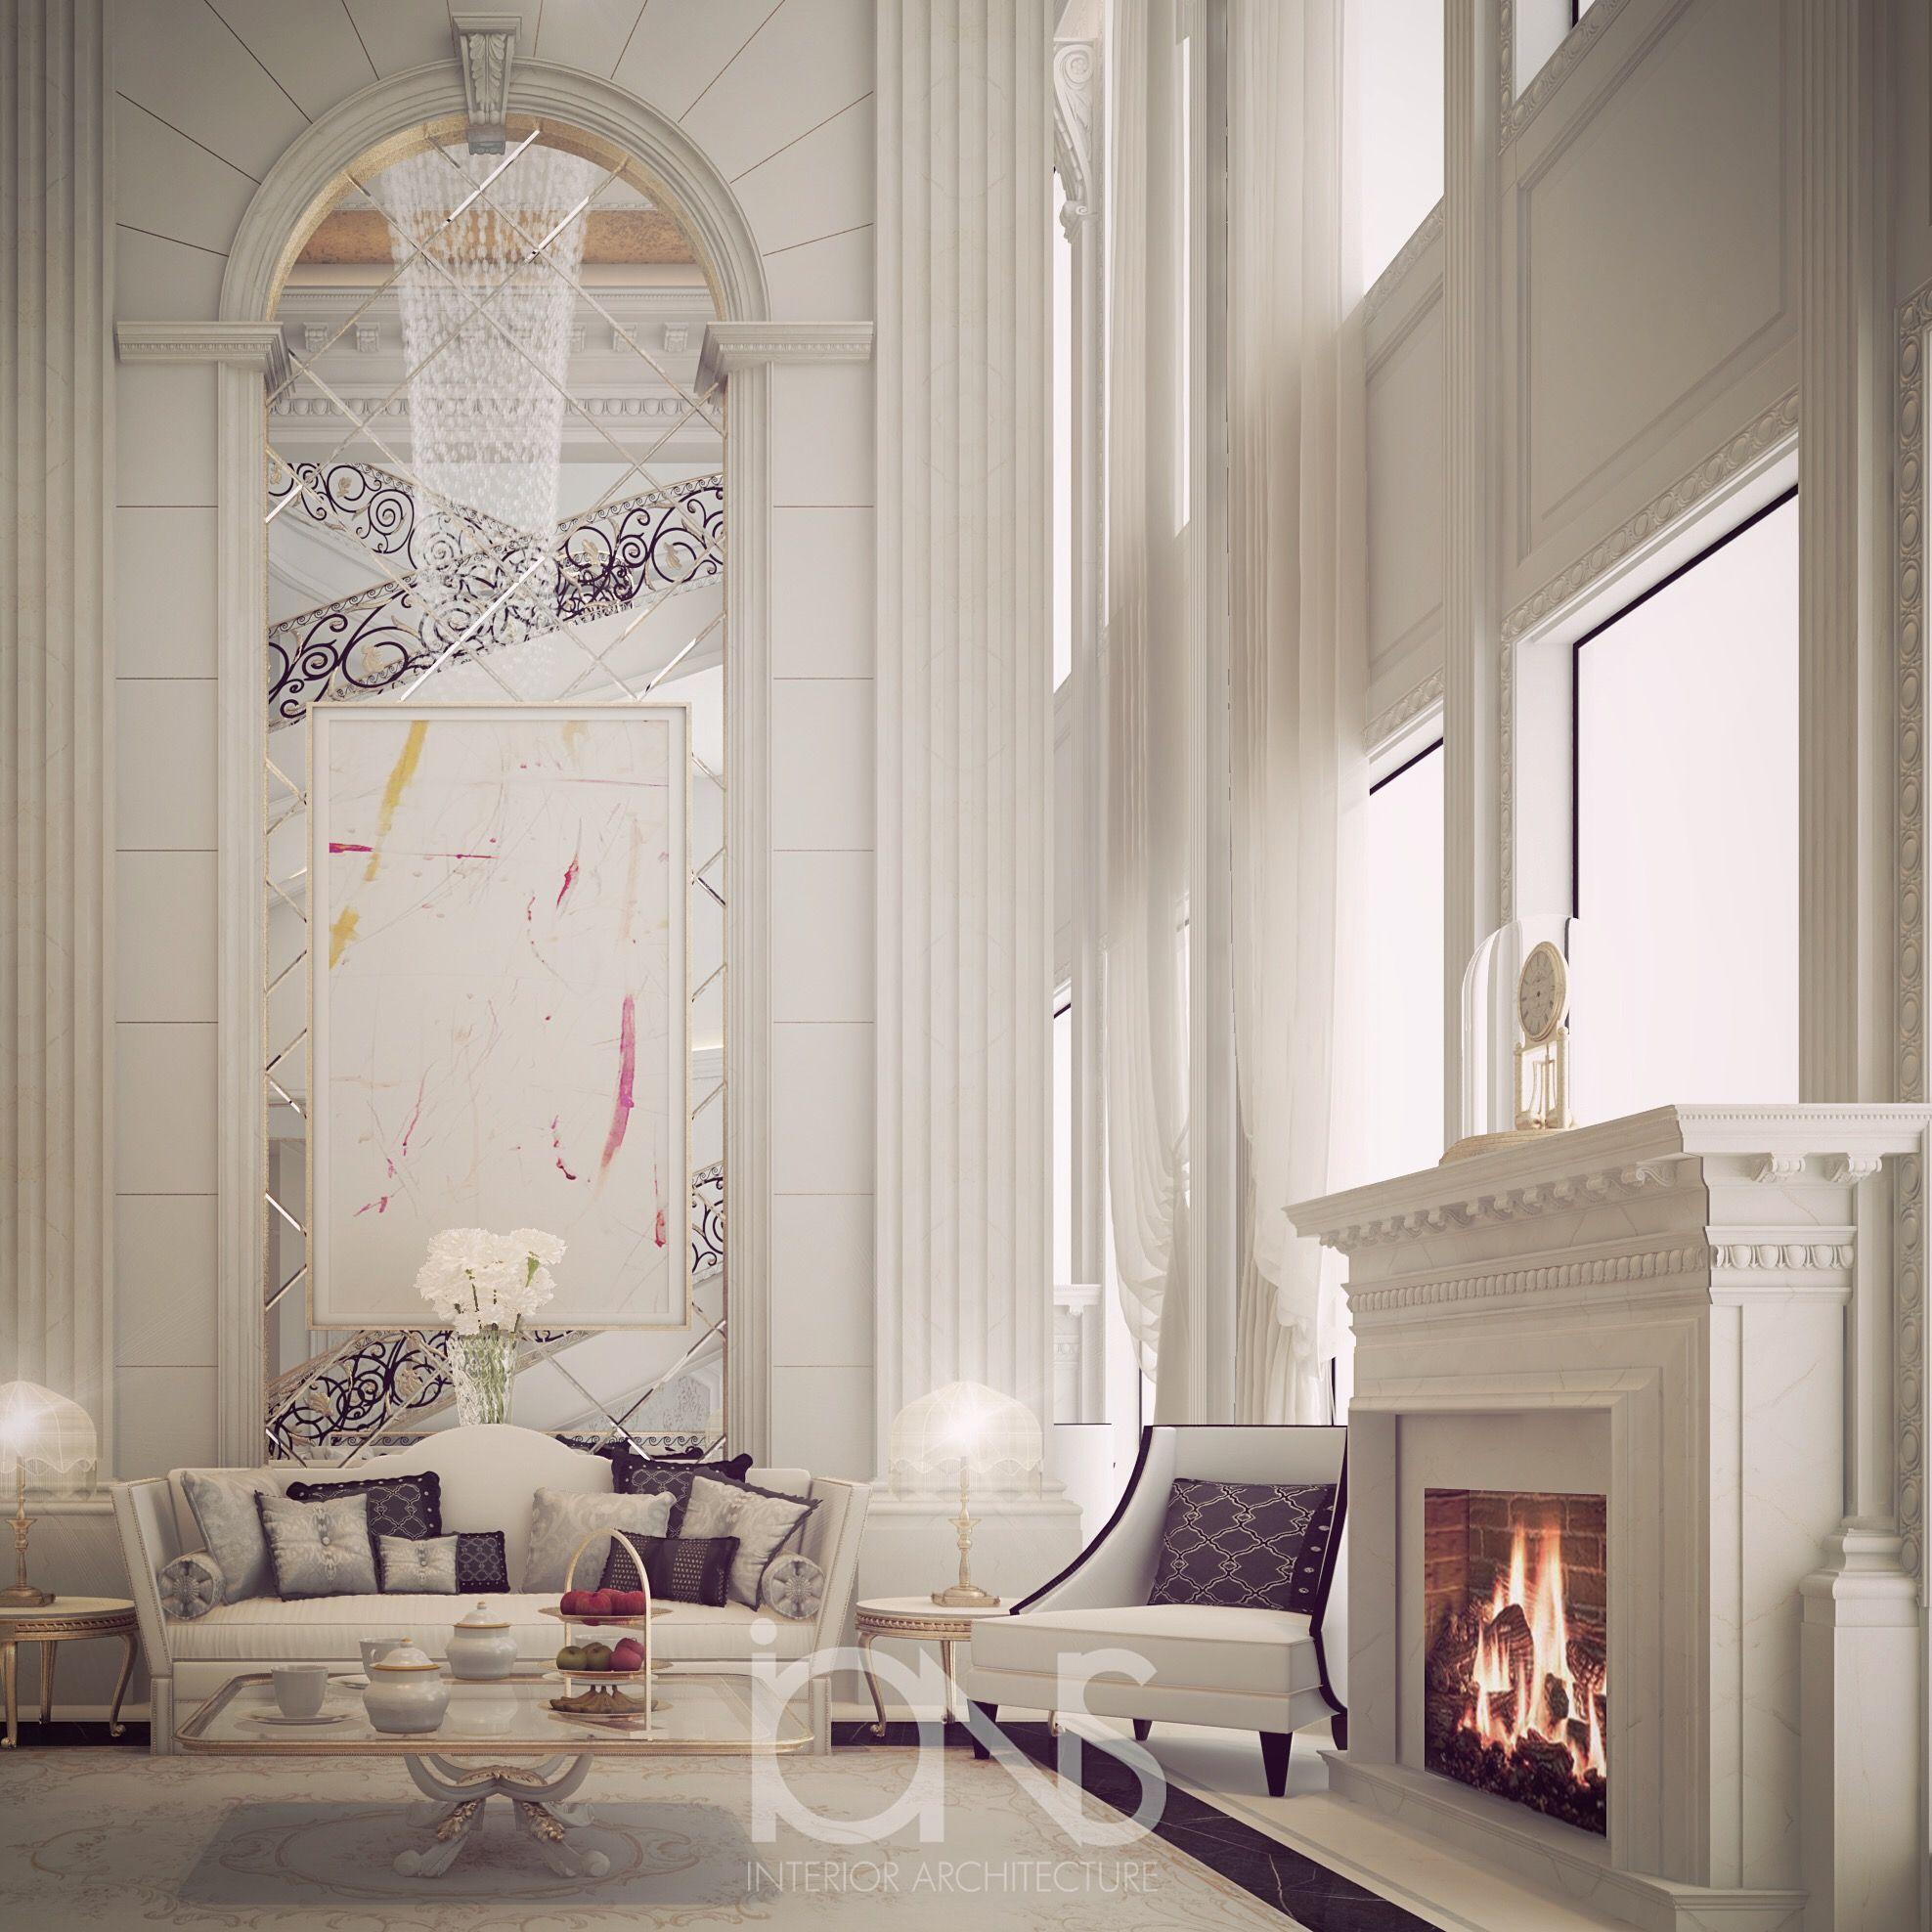 Fireplace lounge design Doha Qatar